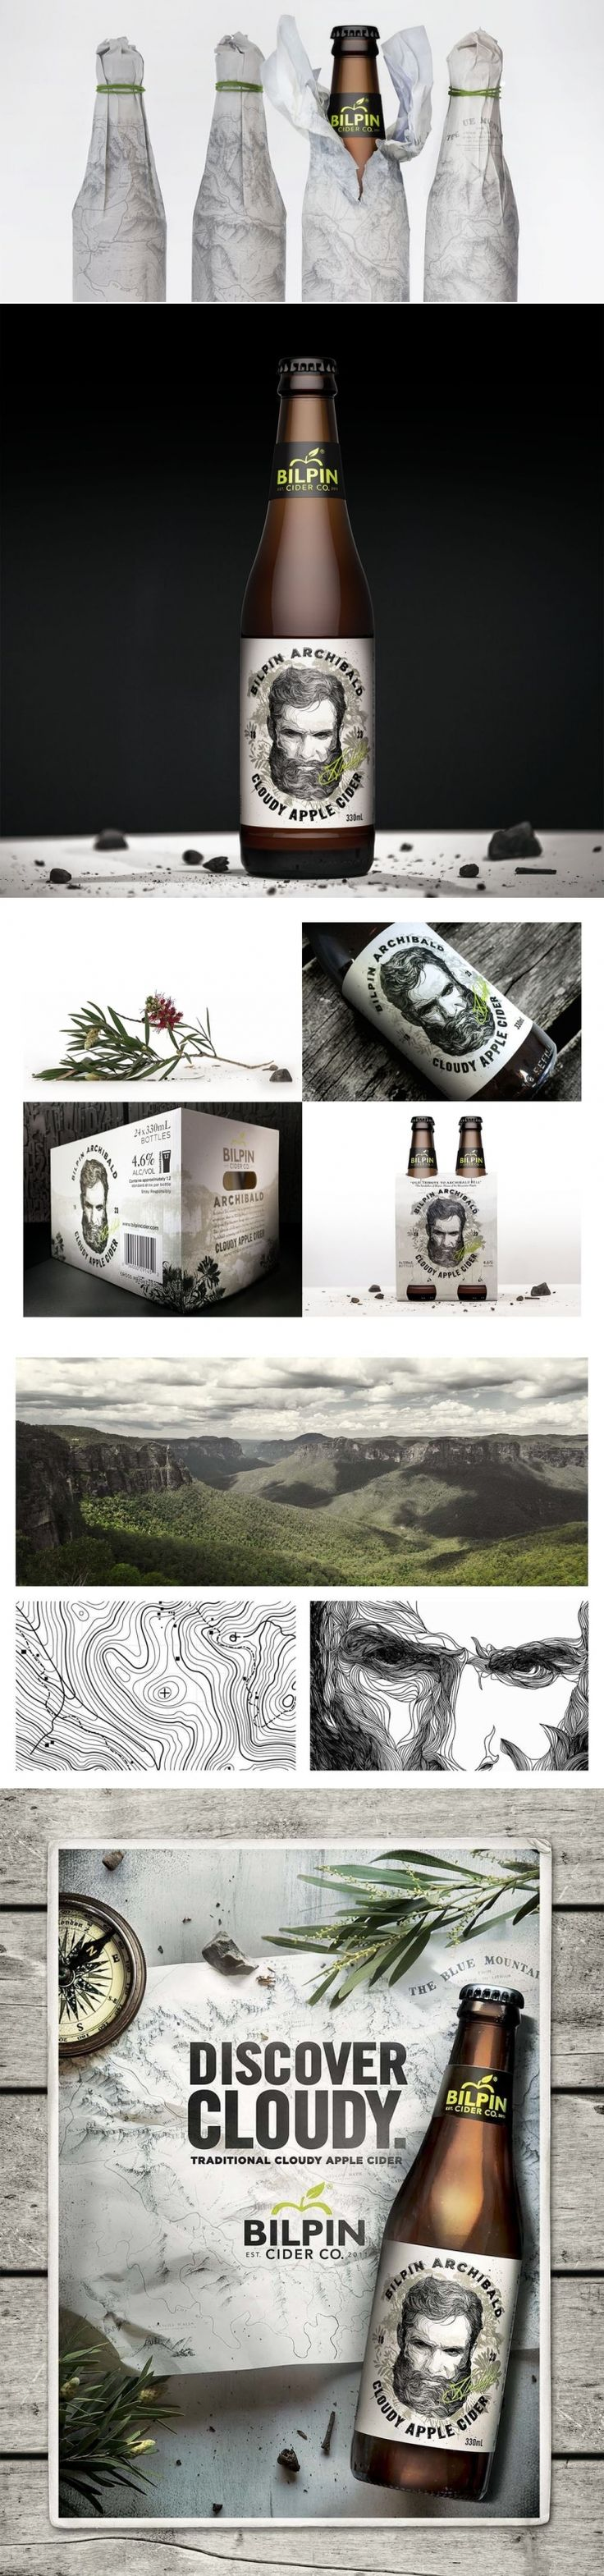 Bilpin Archibald – Cloudy Apple Cider — The Dieline | Packaging & Branding Design & Innovation News